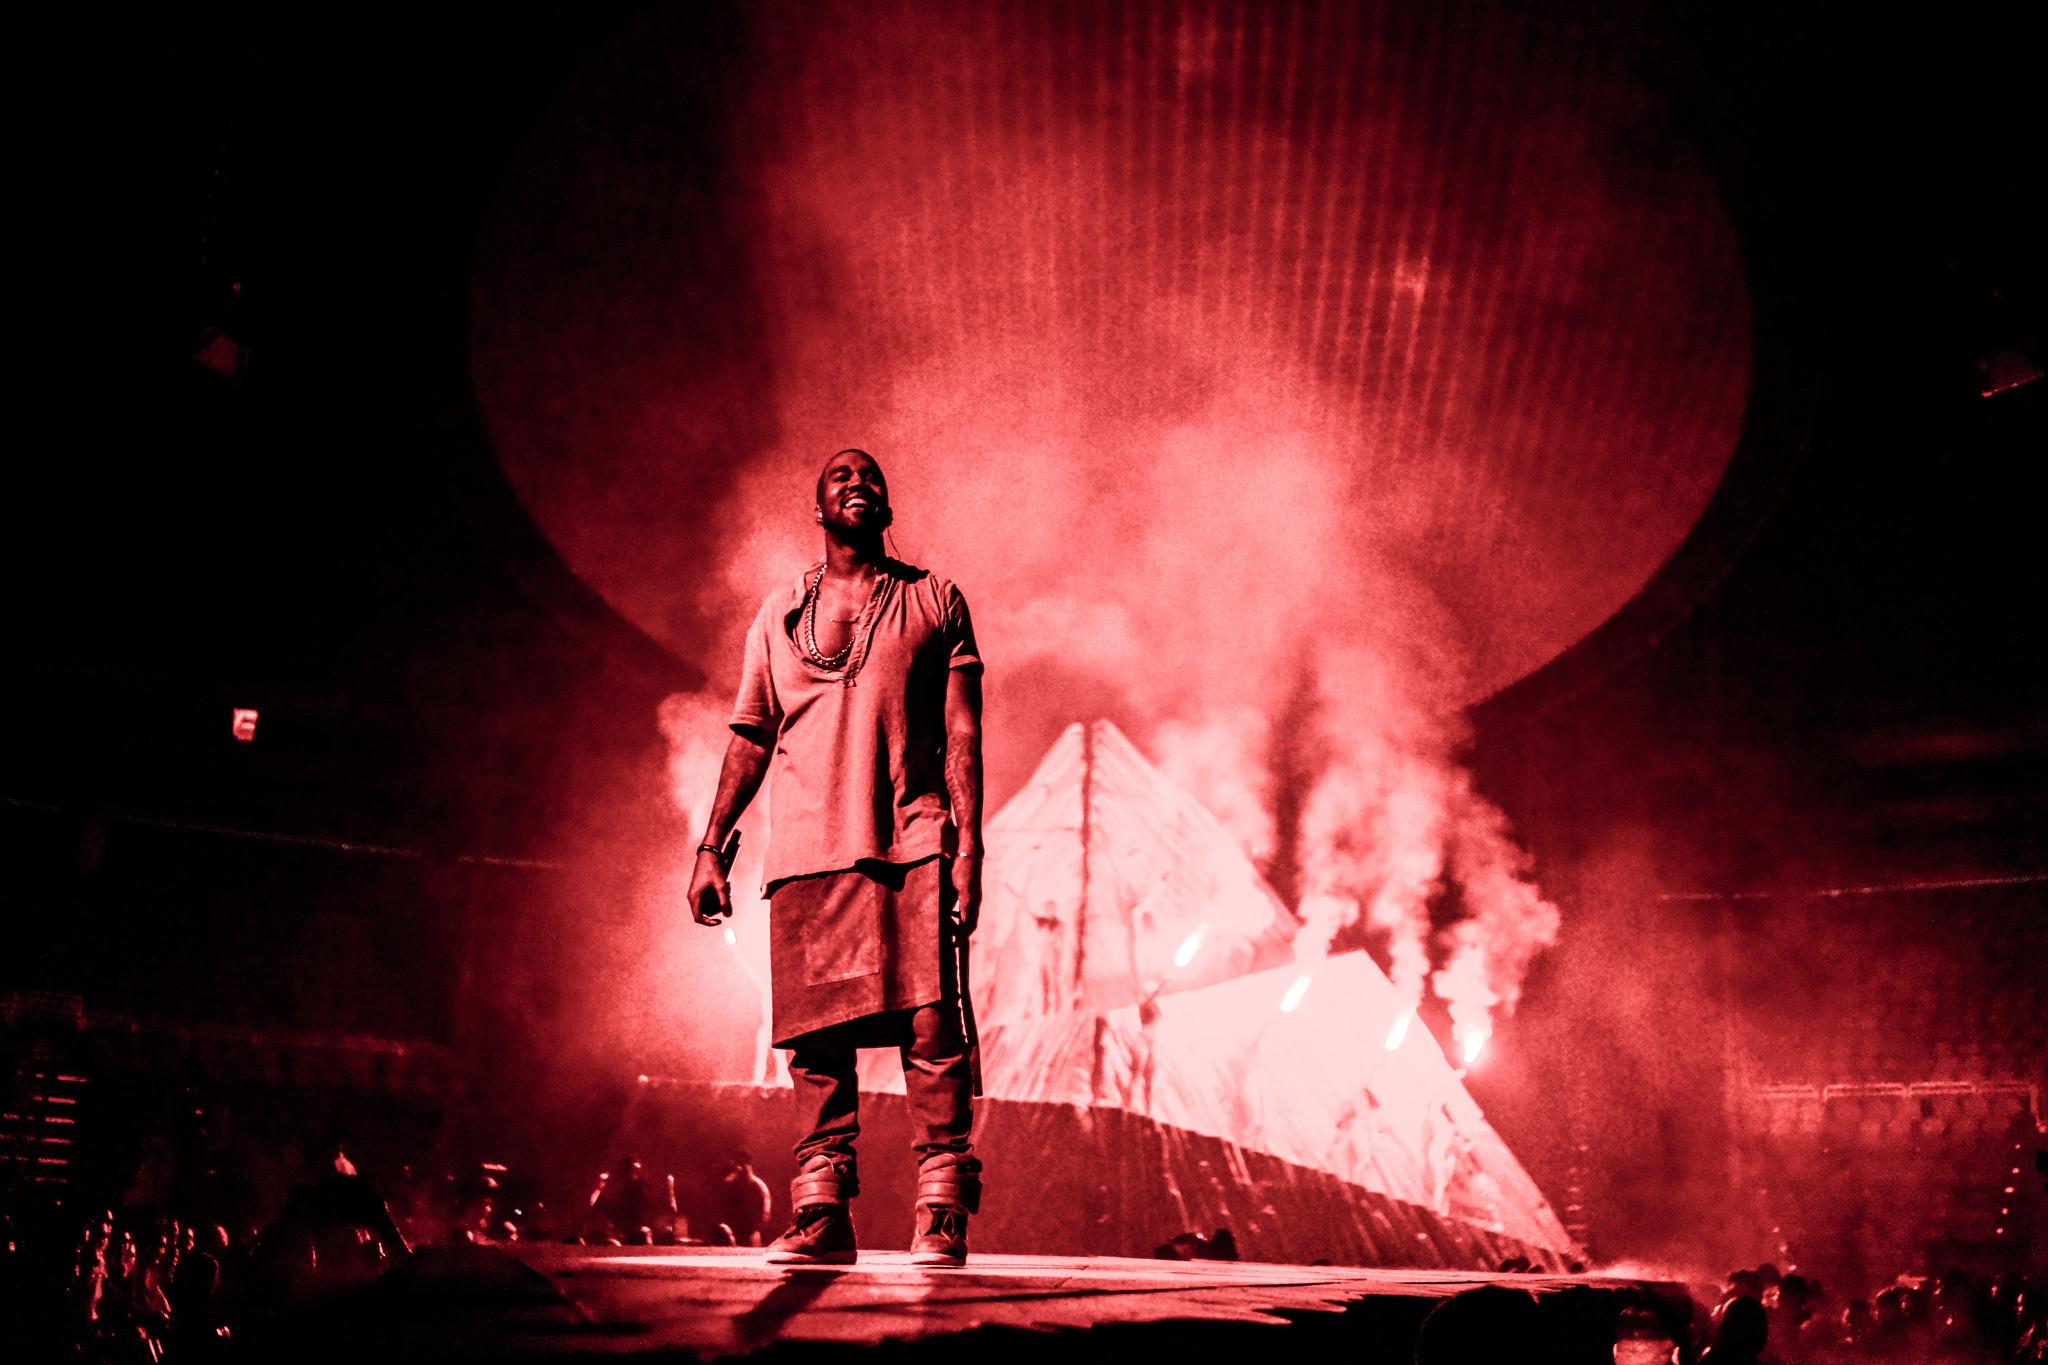 URBYN LOFT Kanye West Announces The Yeezy III 2048x1365